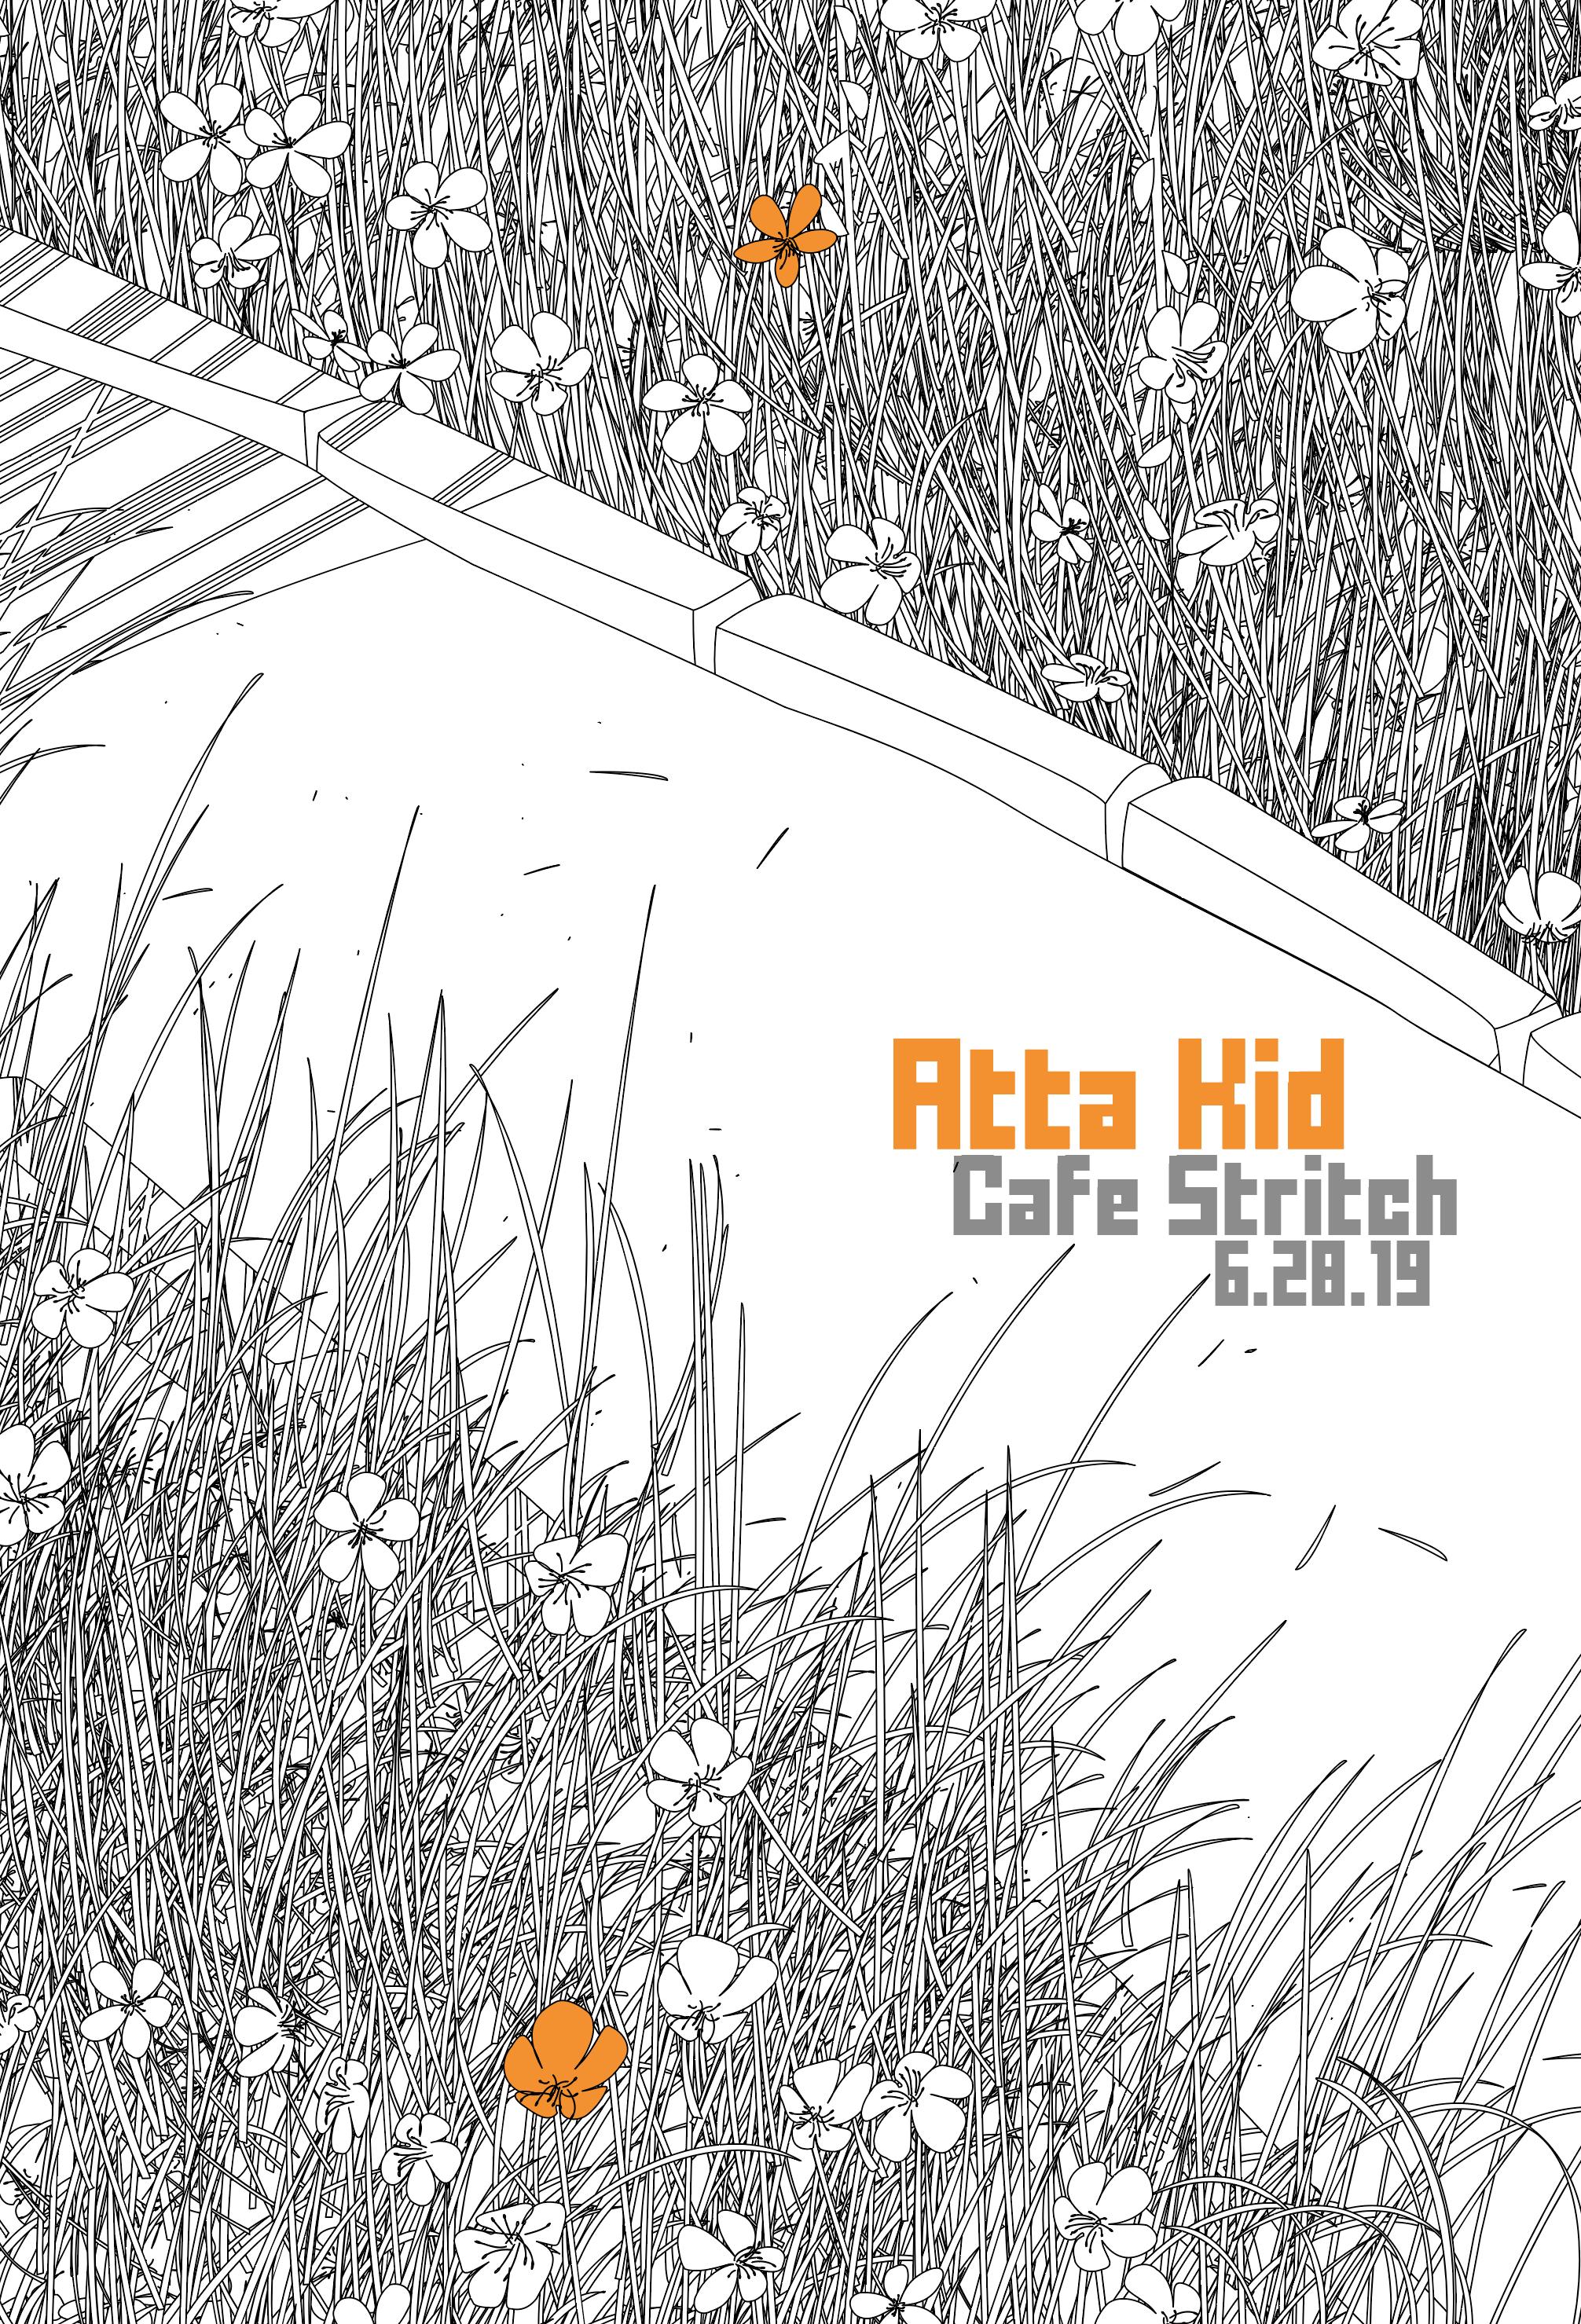 Atta Kid Cafe Stritch 6.28.19.png